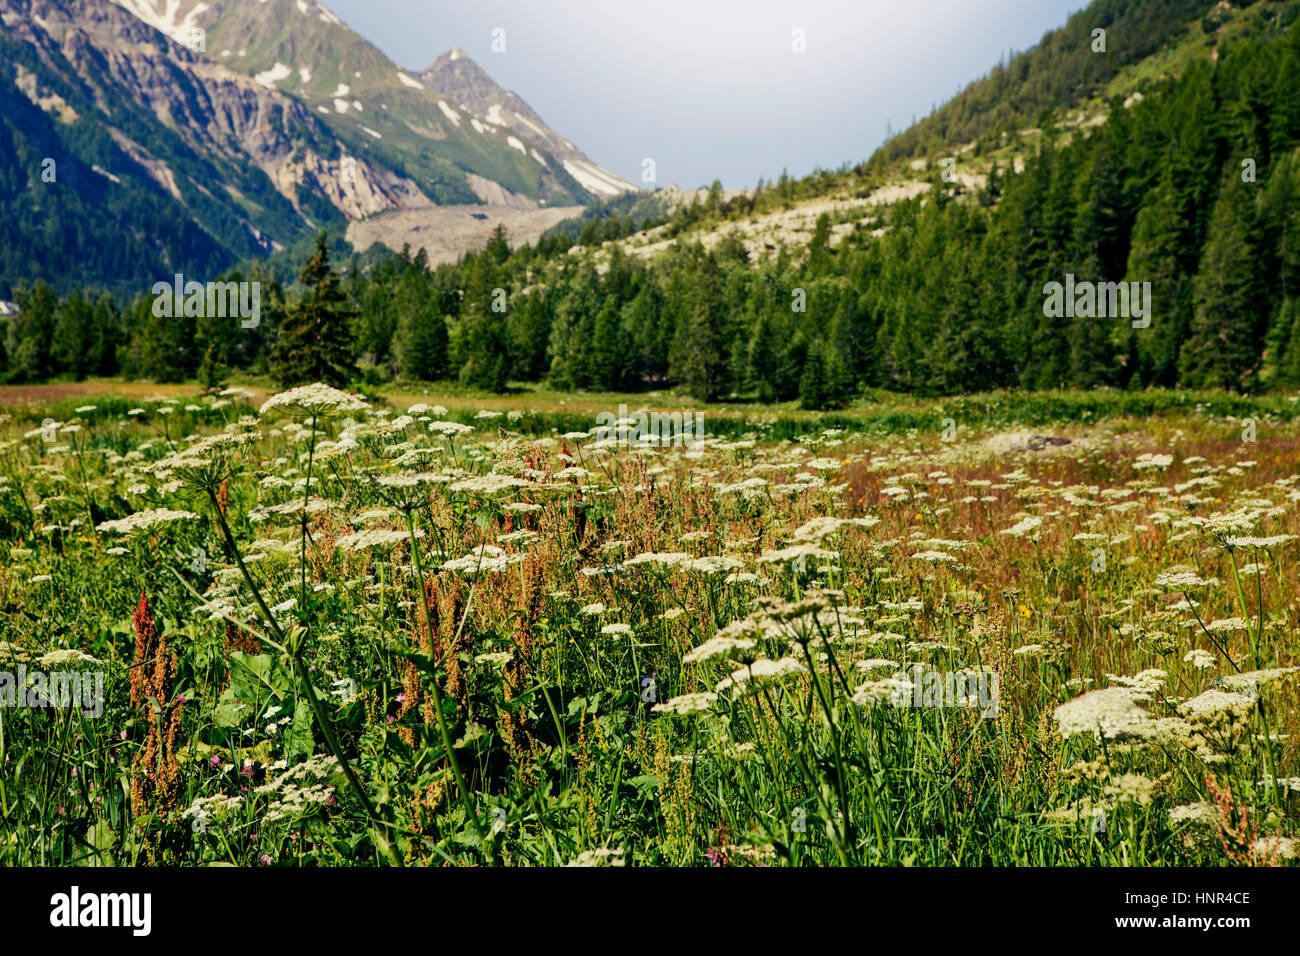 Val Veny, Mont Blanc landscape, Valle d'Aosta, Italy - Stock Image